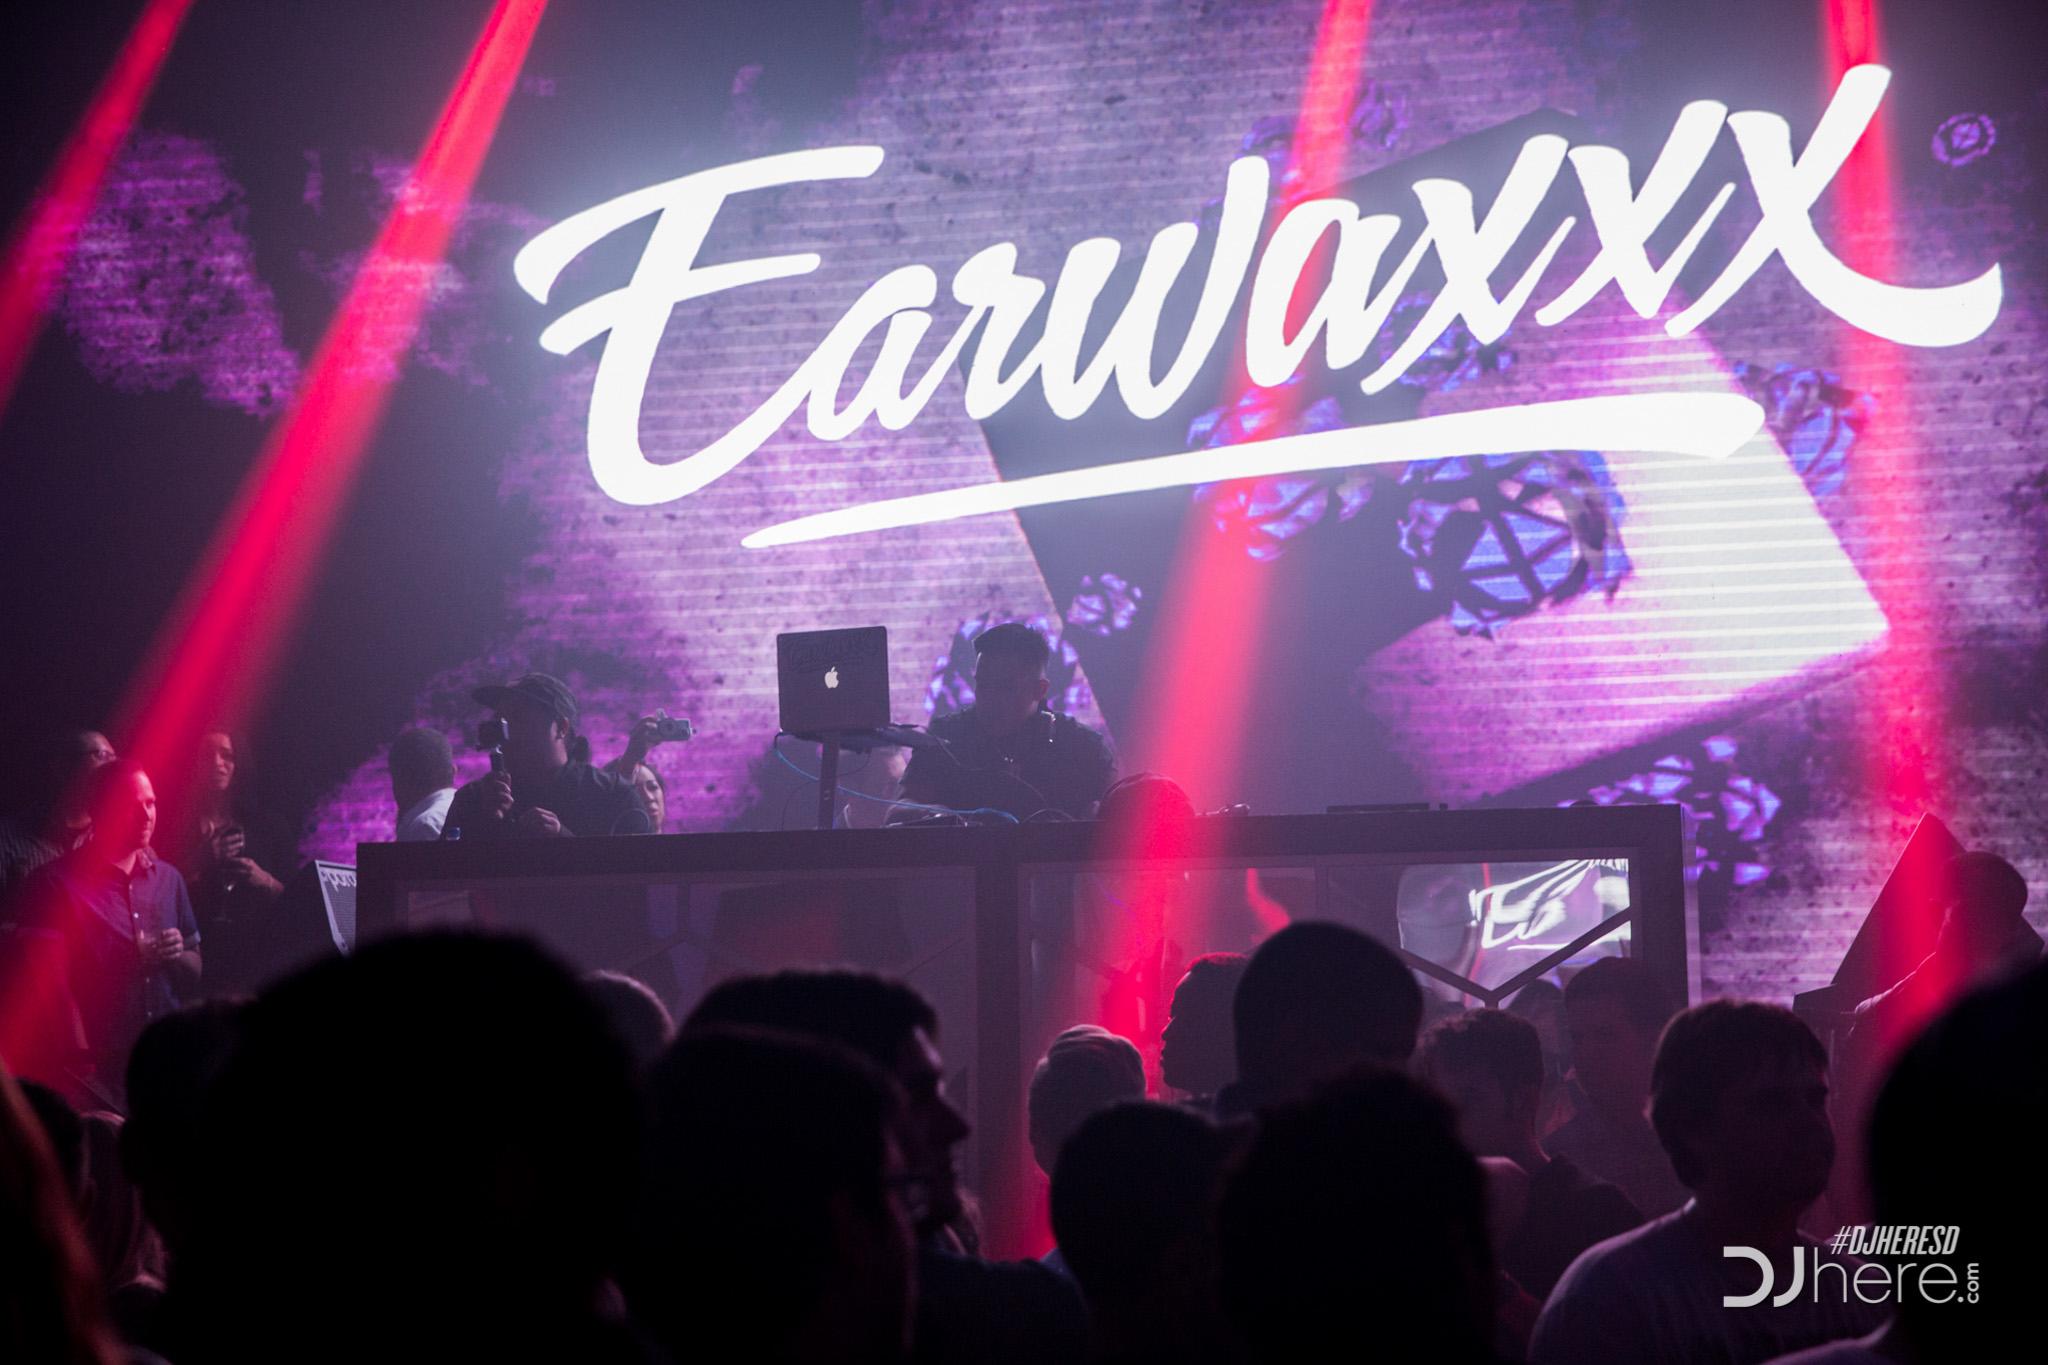 Earwaxxx at Parq Nightclub